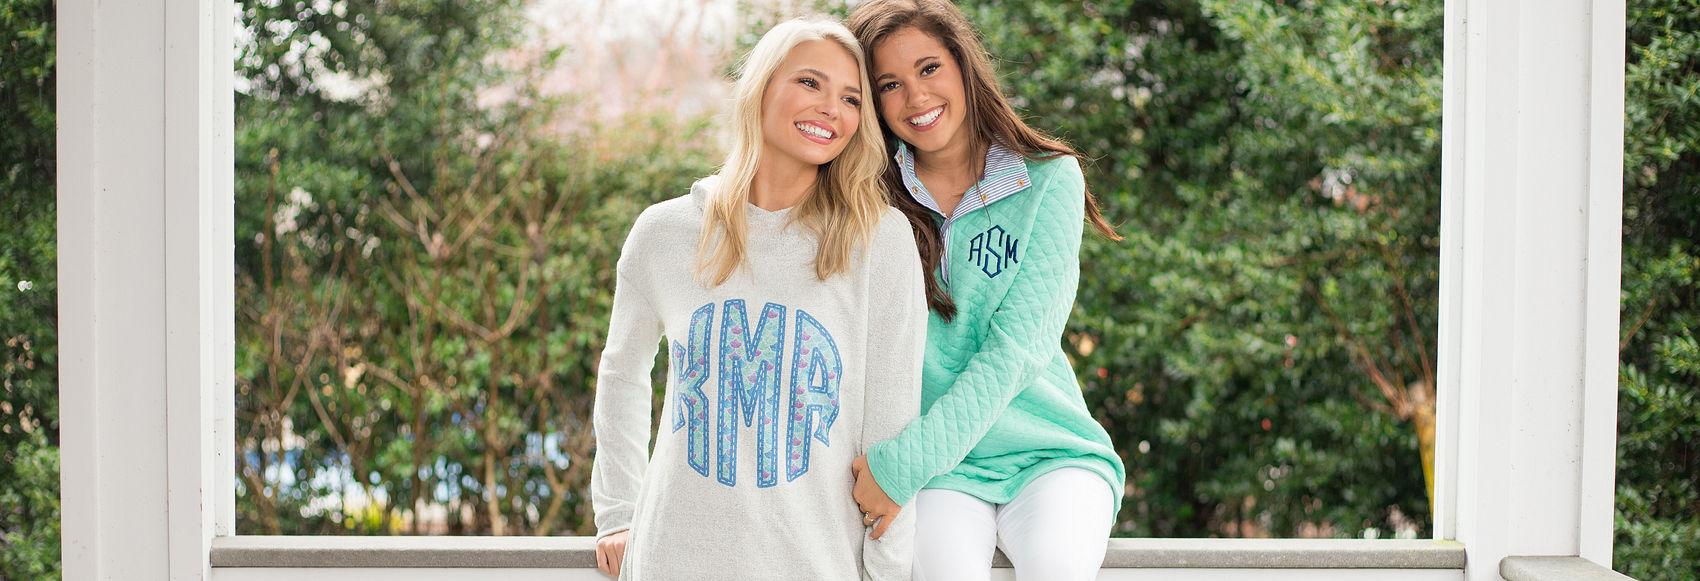 Personalized Sweatshirts